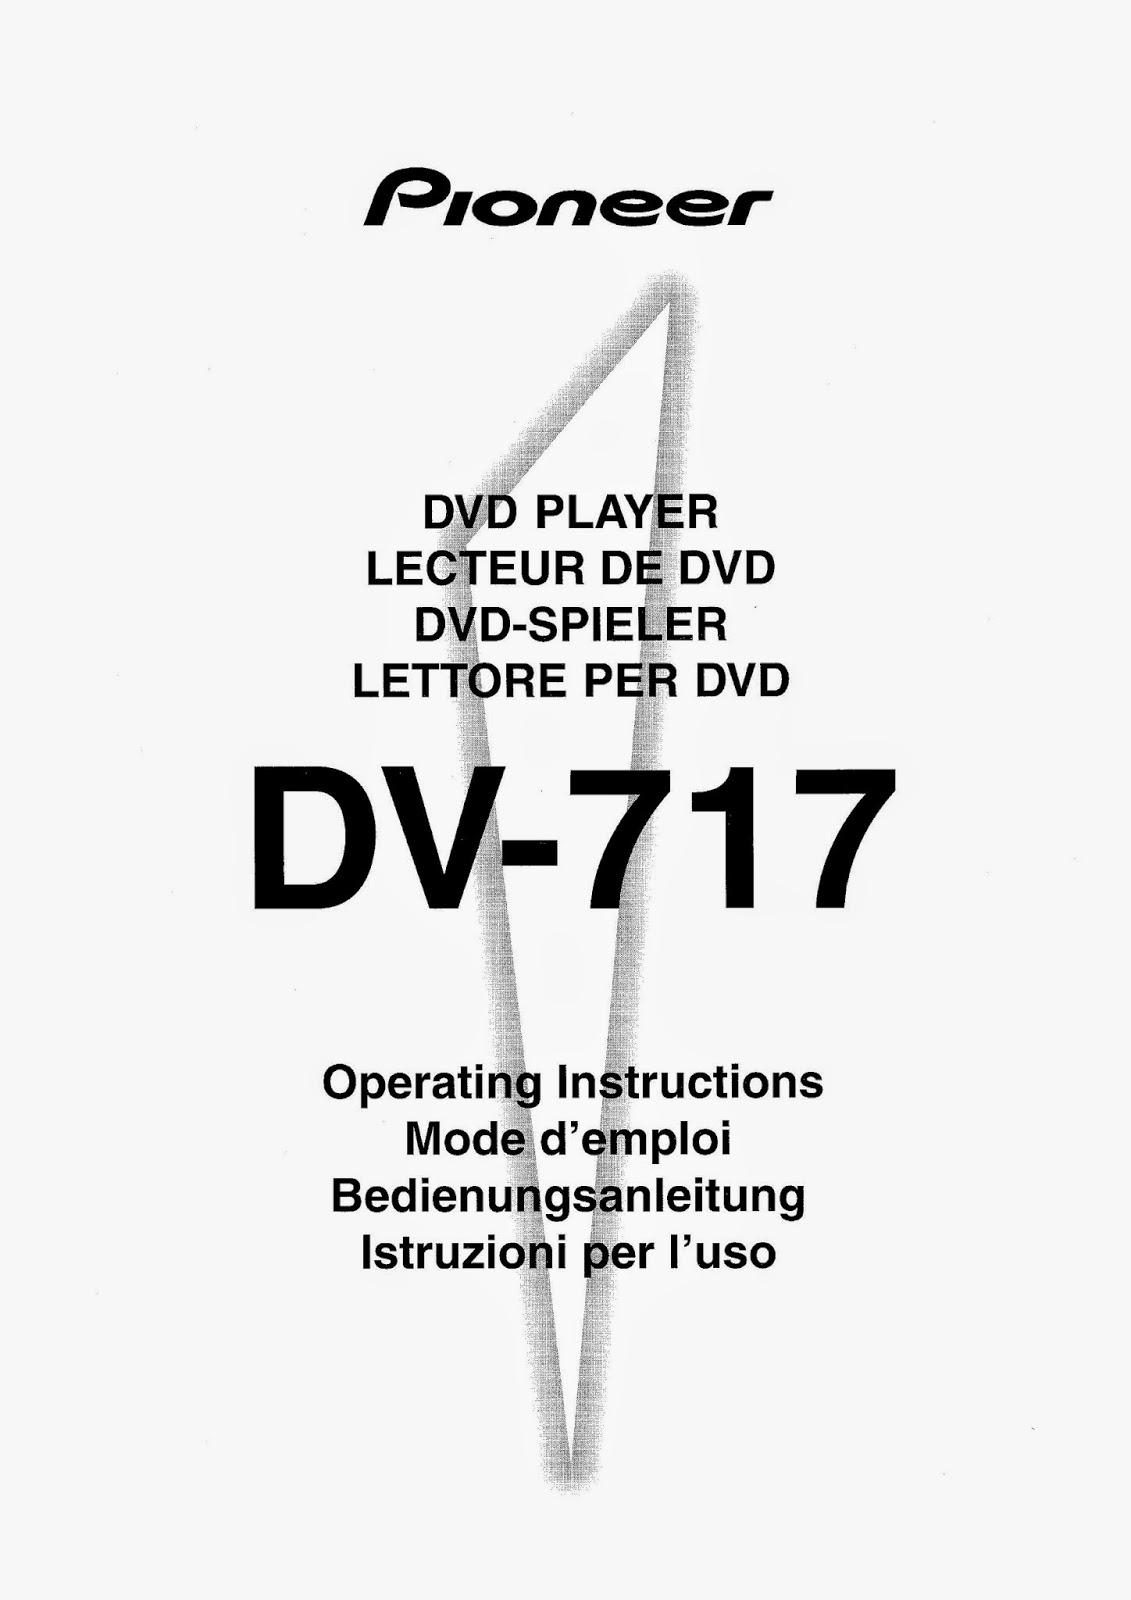 PIONEER DV-717 SERVICE MANUAL